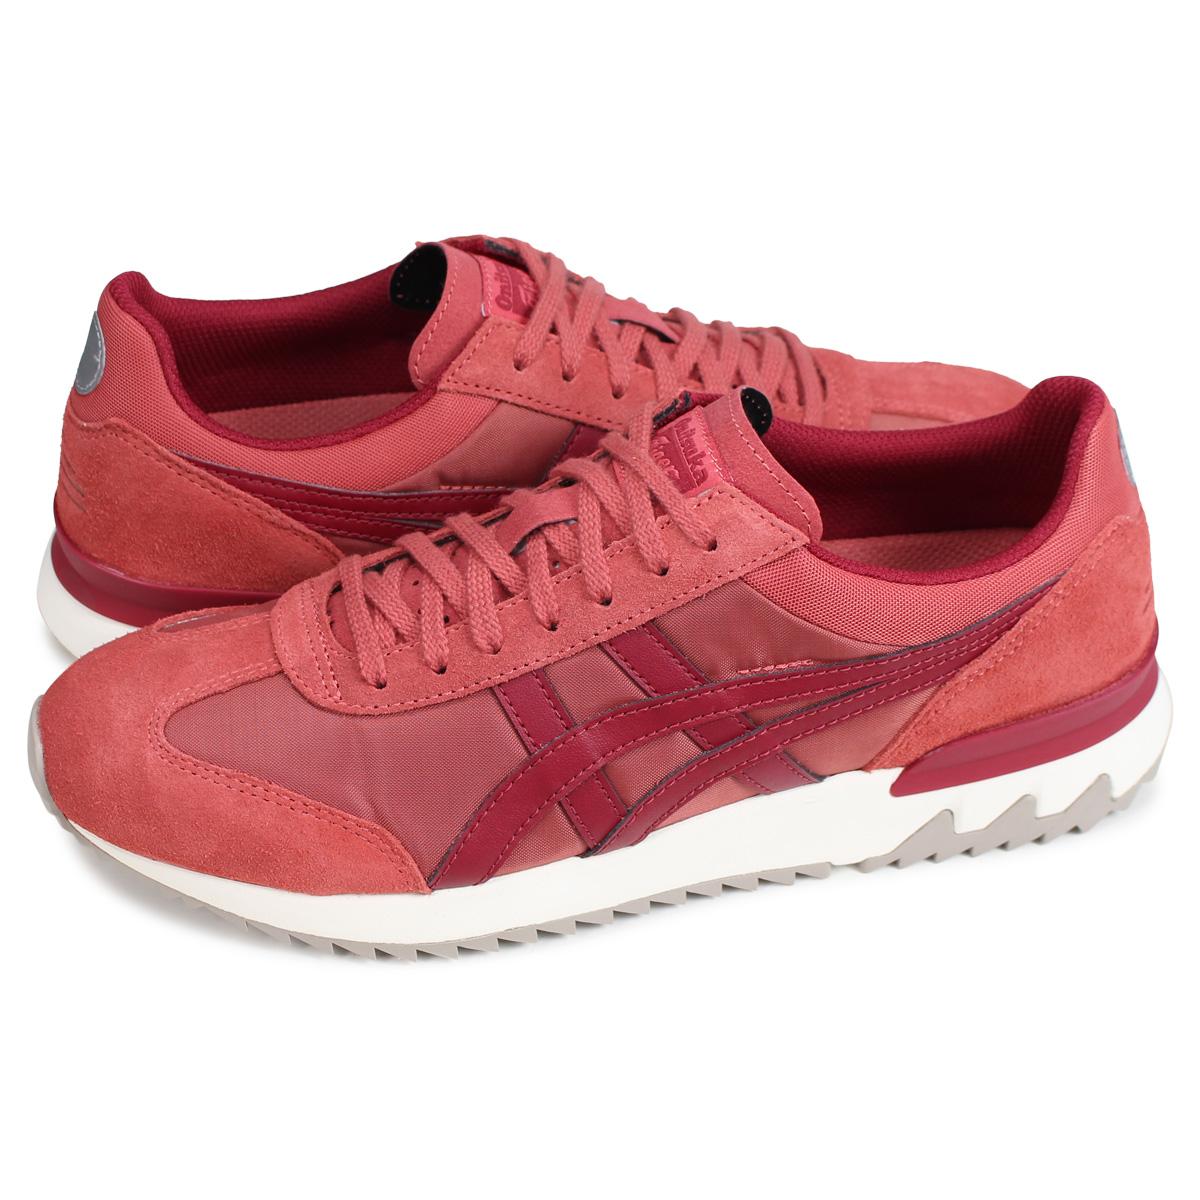 online retailer ed11d c9840 Onitsuka Tiger CALIFORNIA 78 EX Onitsuka tiger 78, California men gap Dis  sneakers 1183A194-600 red [1810]